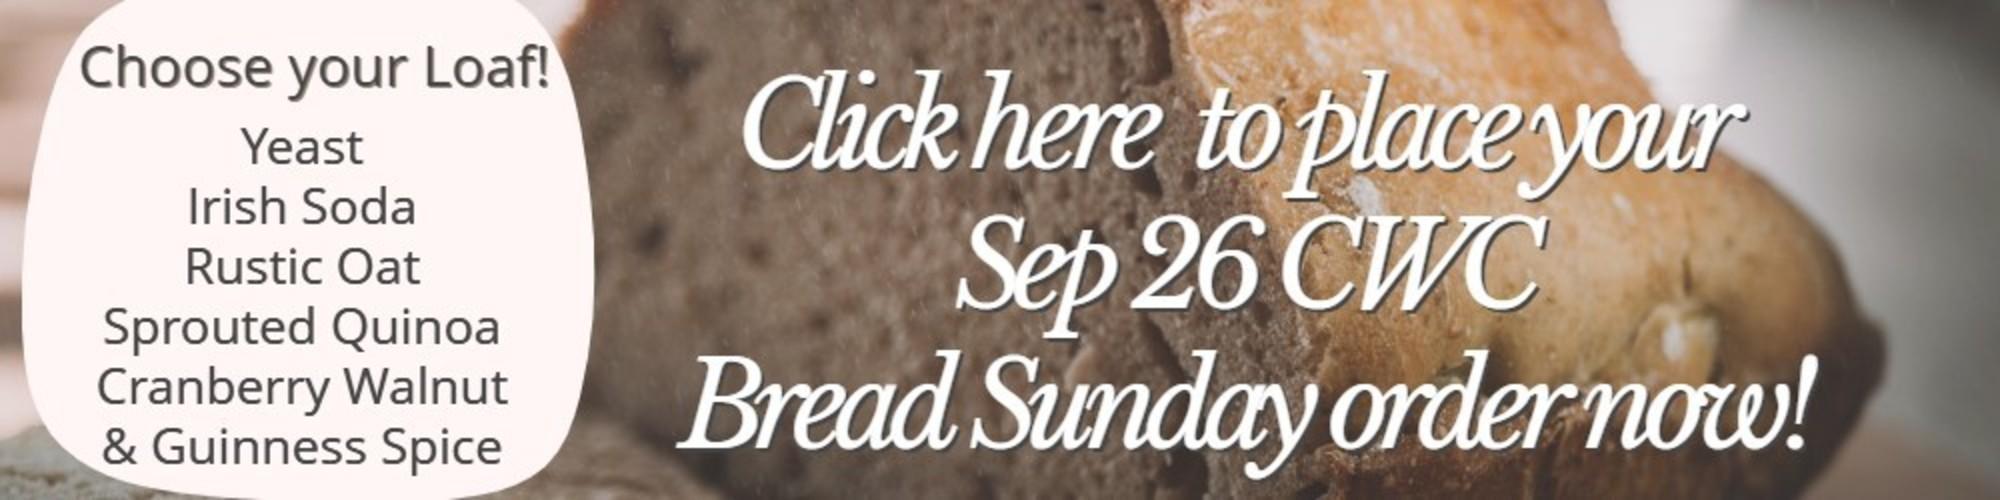 Bread Sunday Order 1000x250 Sep